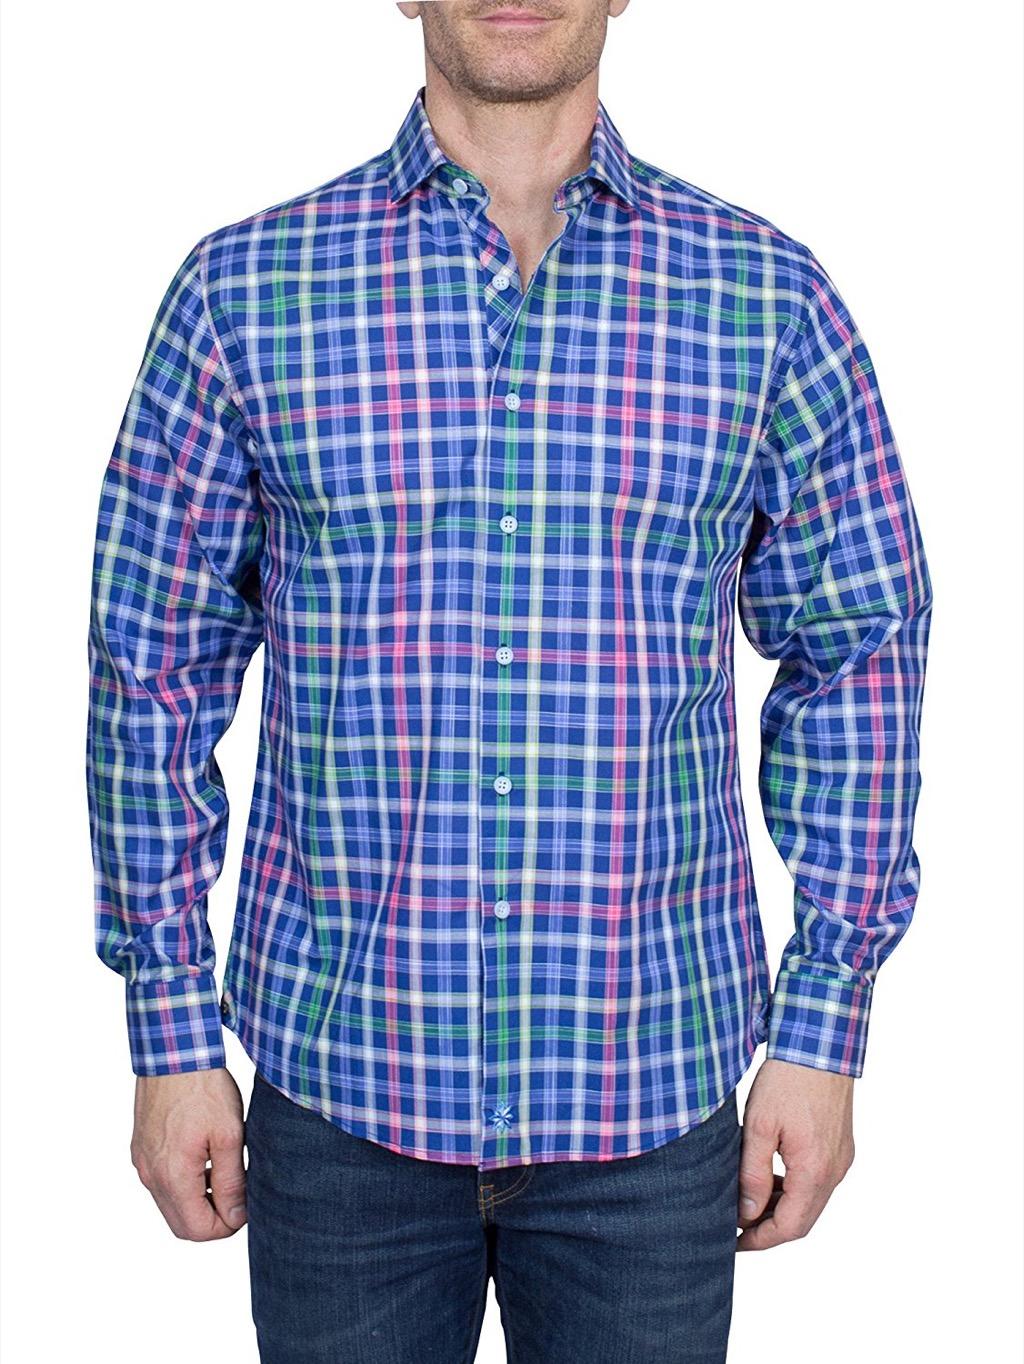 thaddeus frank untucked shirt